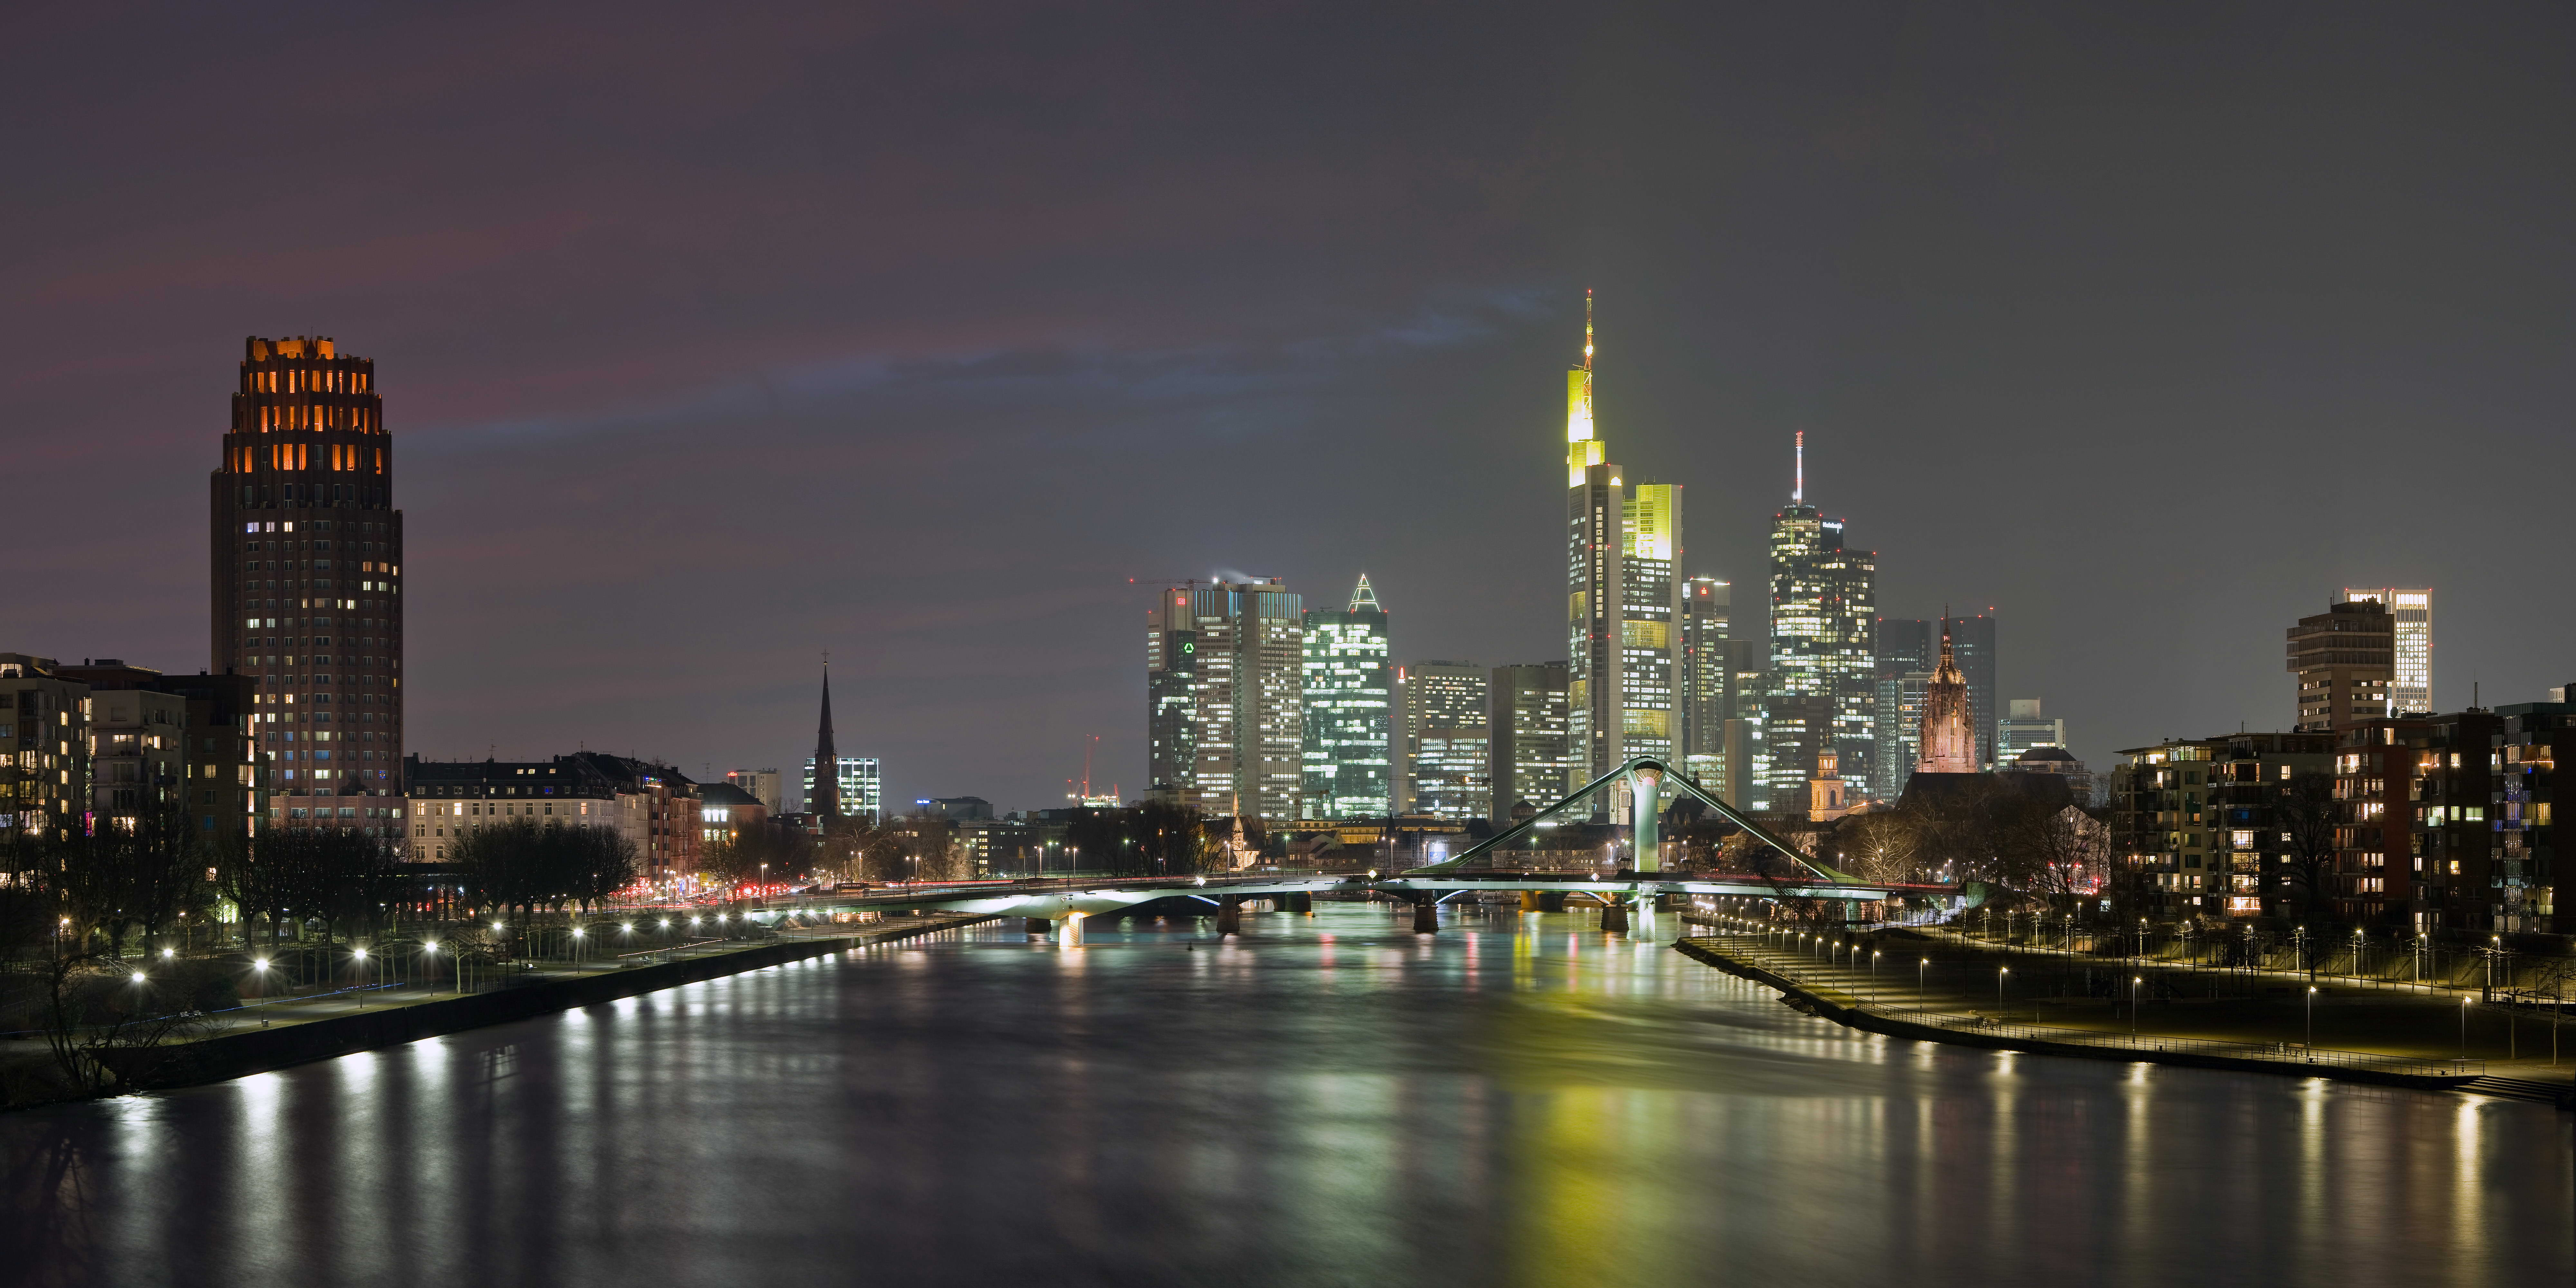 страны архитектура вечер город Франкфурт-на-Майне Германия  № 155517 без смс